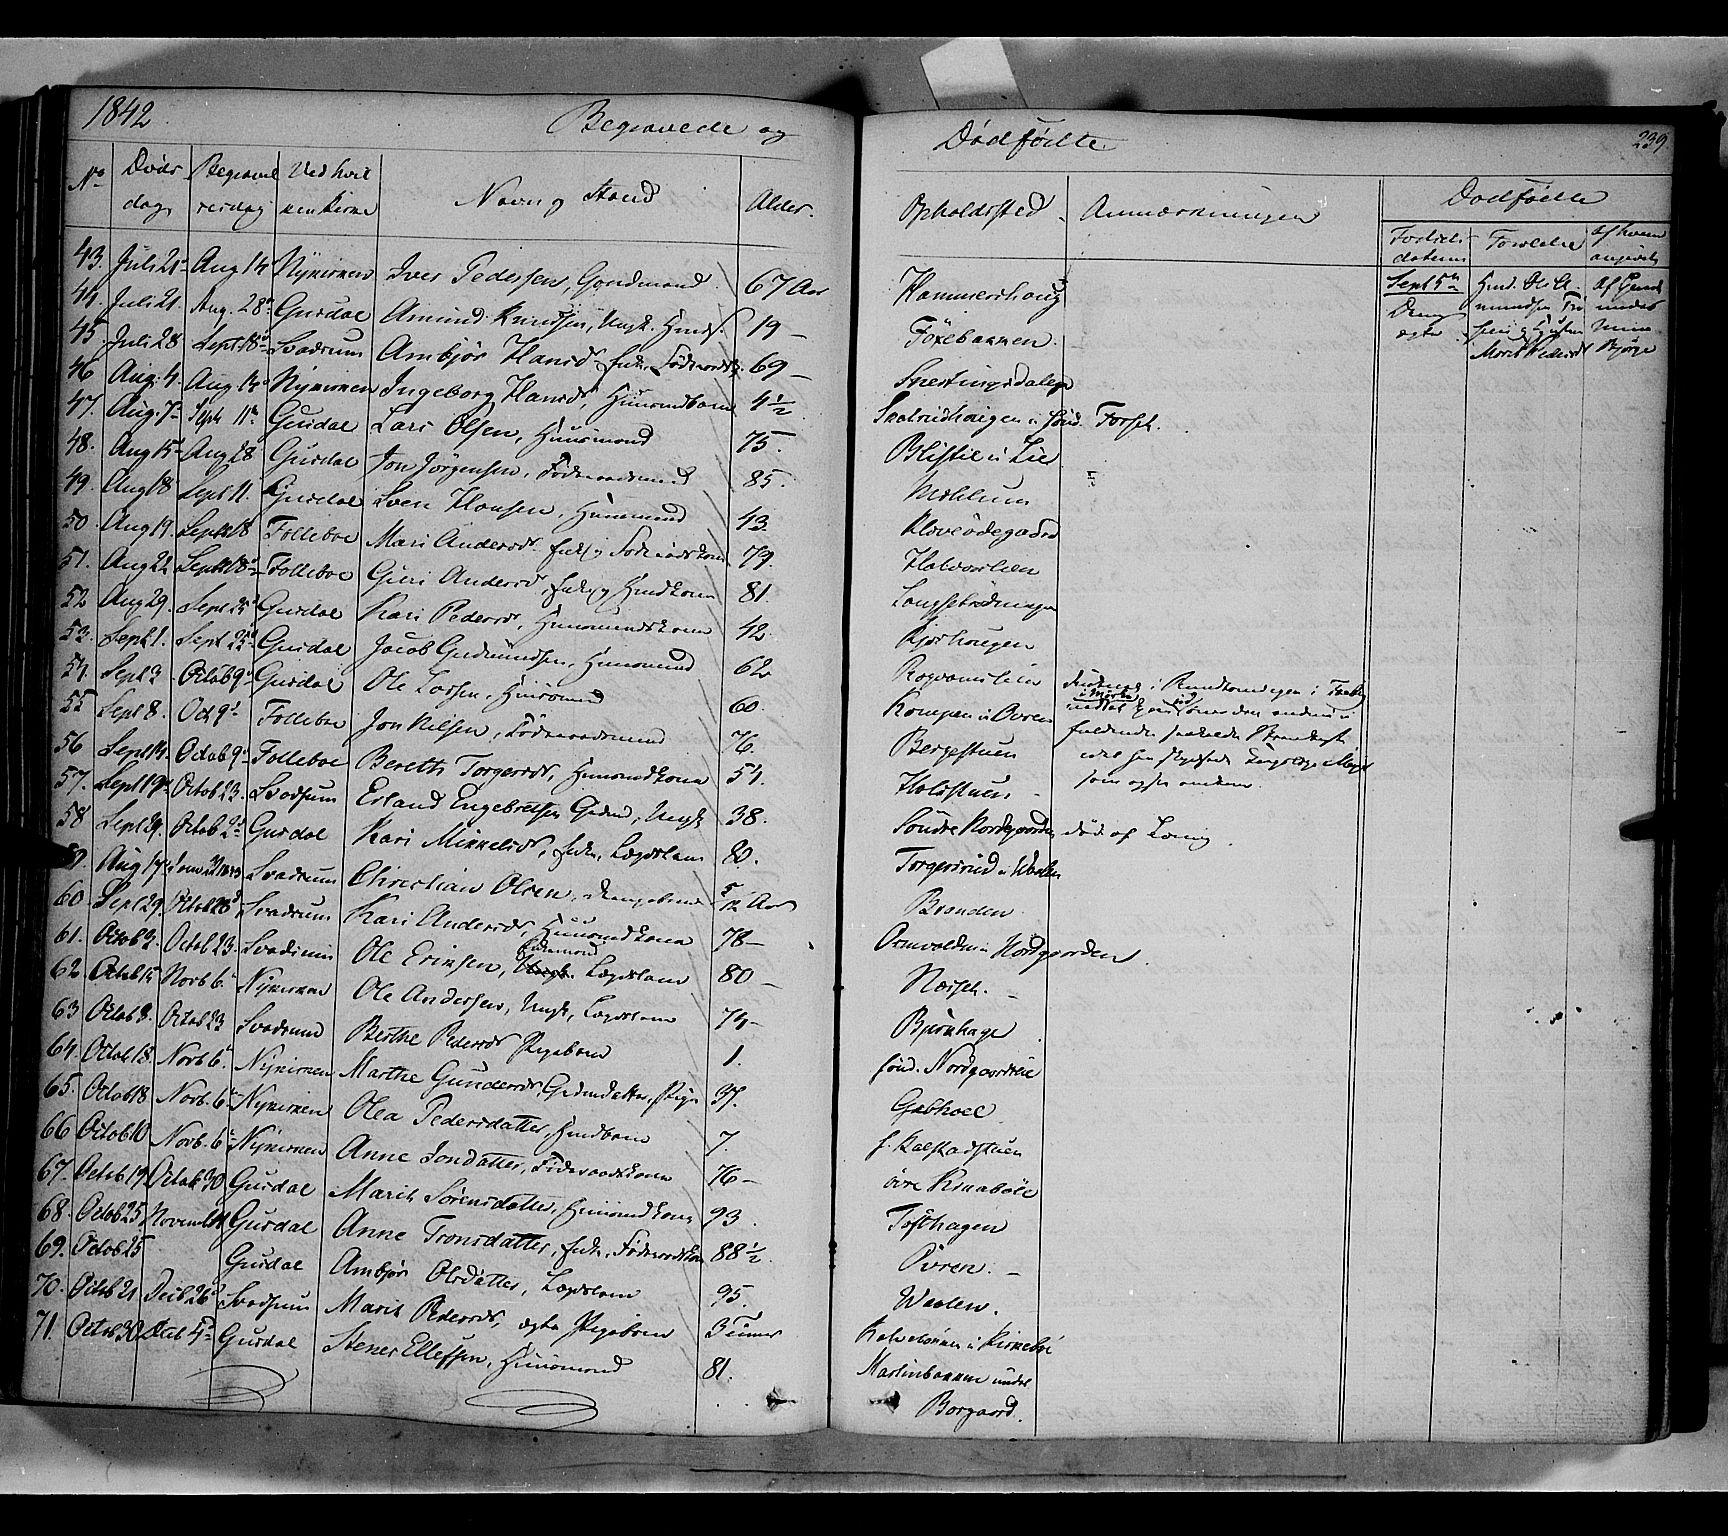 SAH, Gausdal prestekontor, Ministerialbok nr. 7, 1840-1850, s. 239